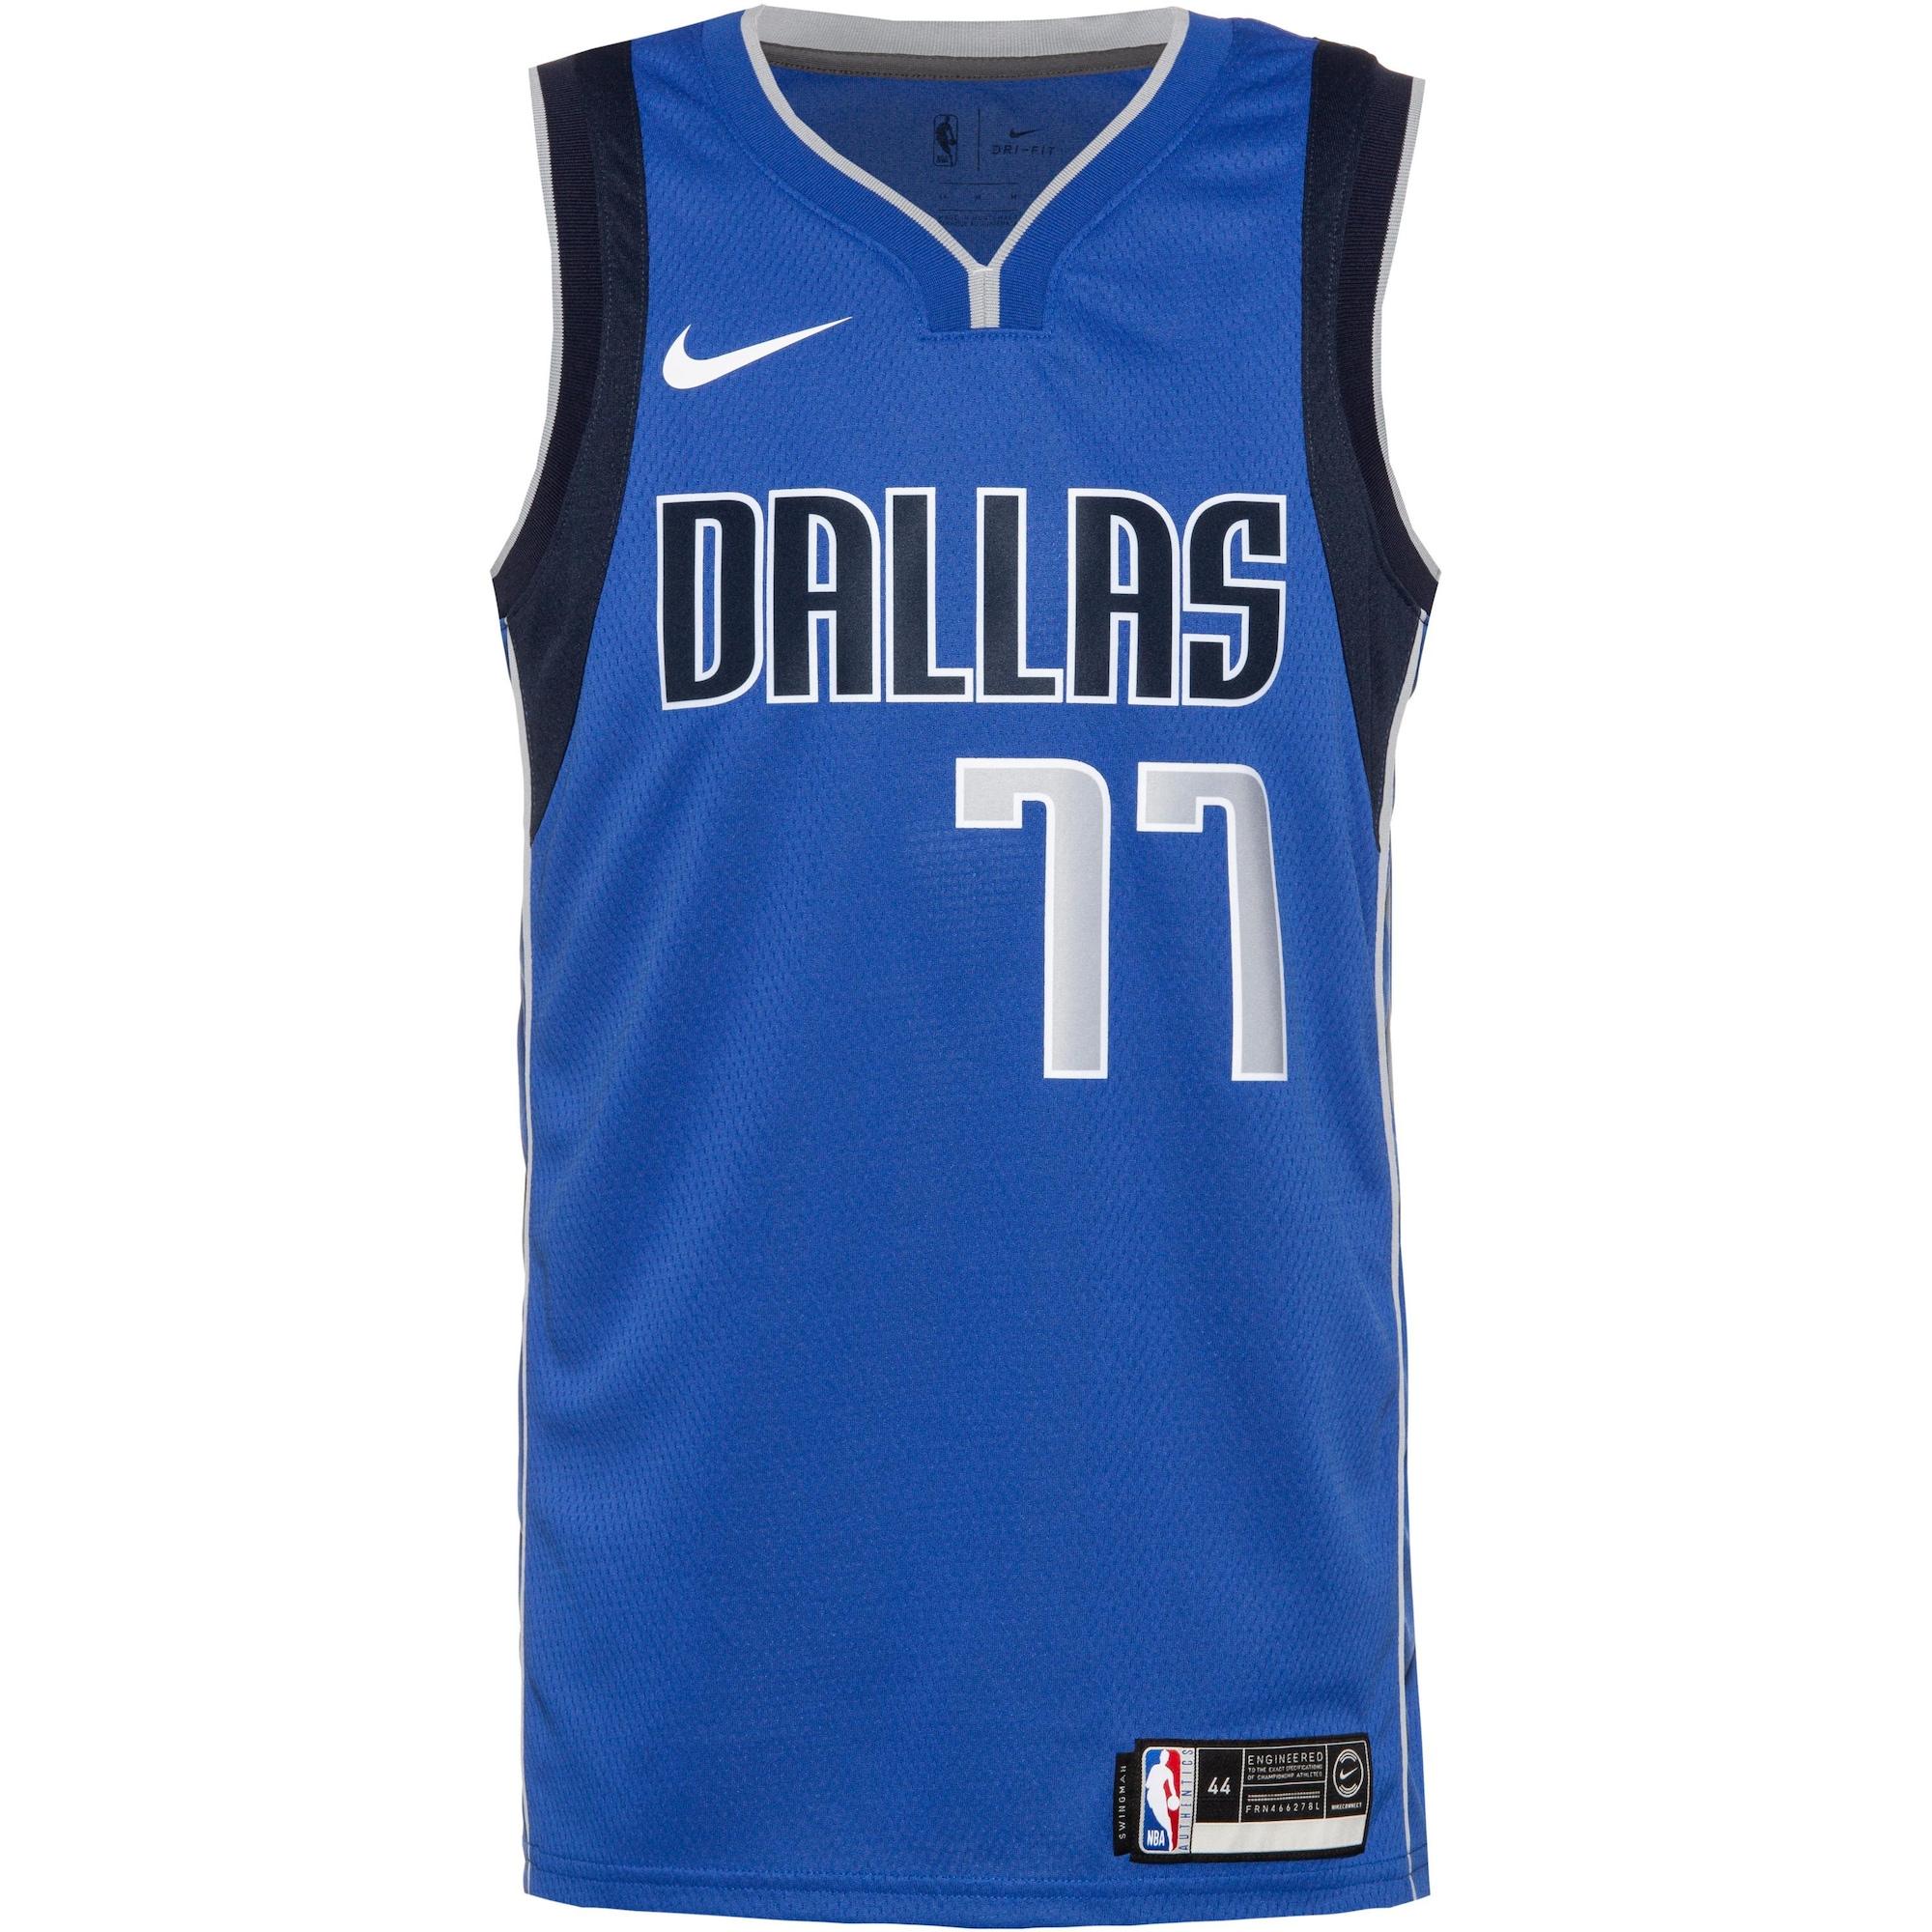 Basketballtrikot 'Luka Doncic Dallas Mavericks'   Sportbekleidung > Trikots   Nike